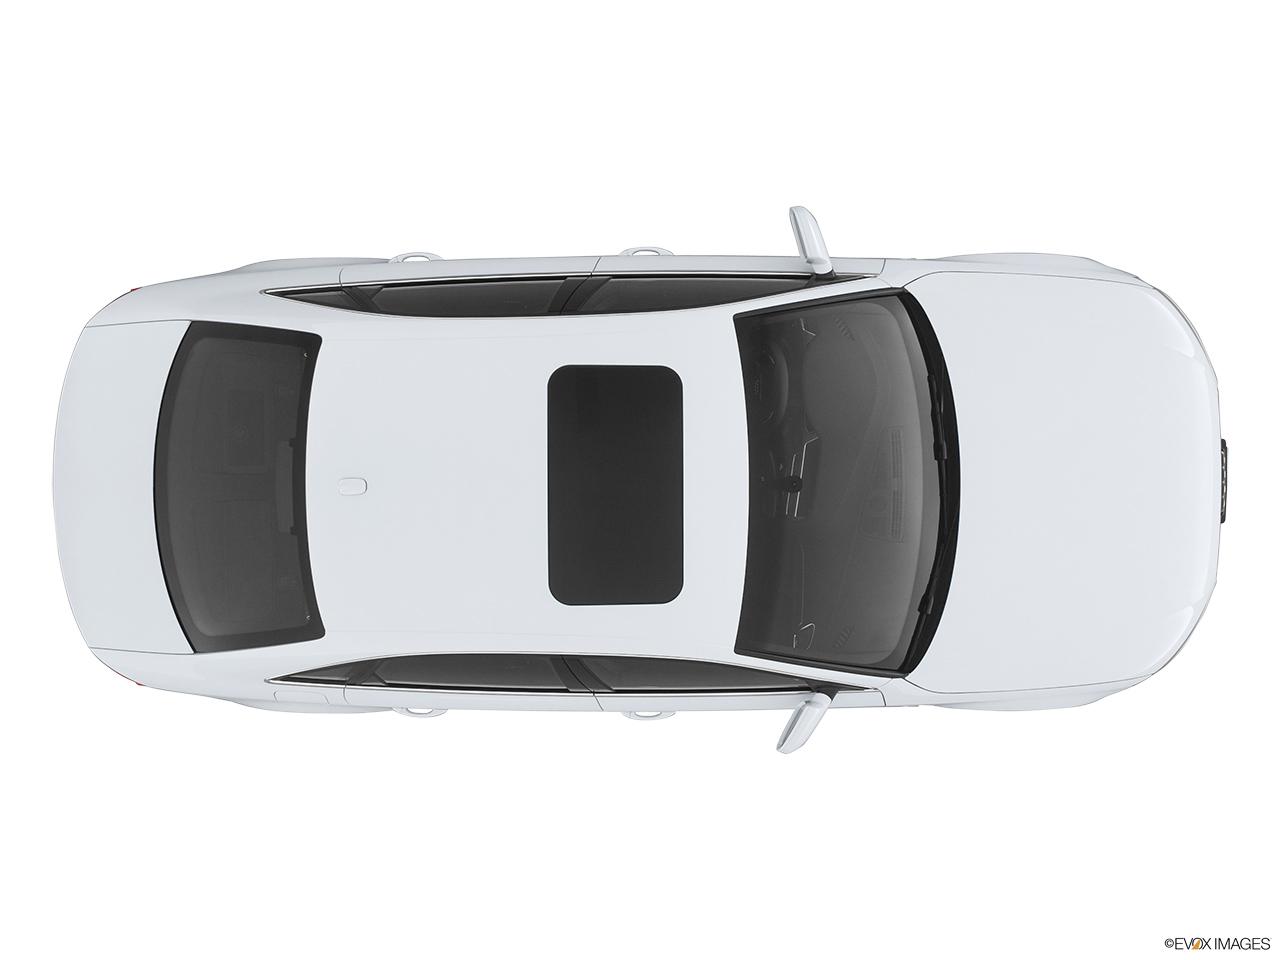 2004 Volkswagen Touareg  User Reviews  CarGurus